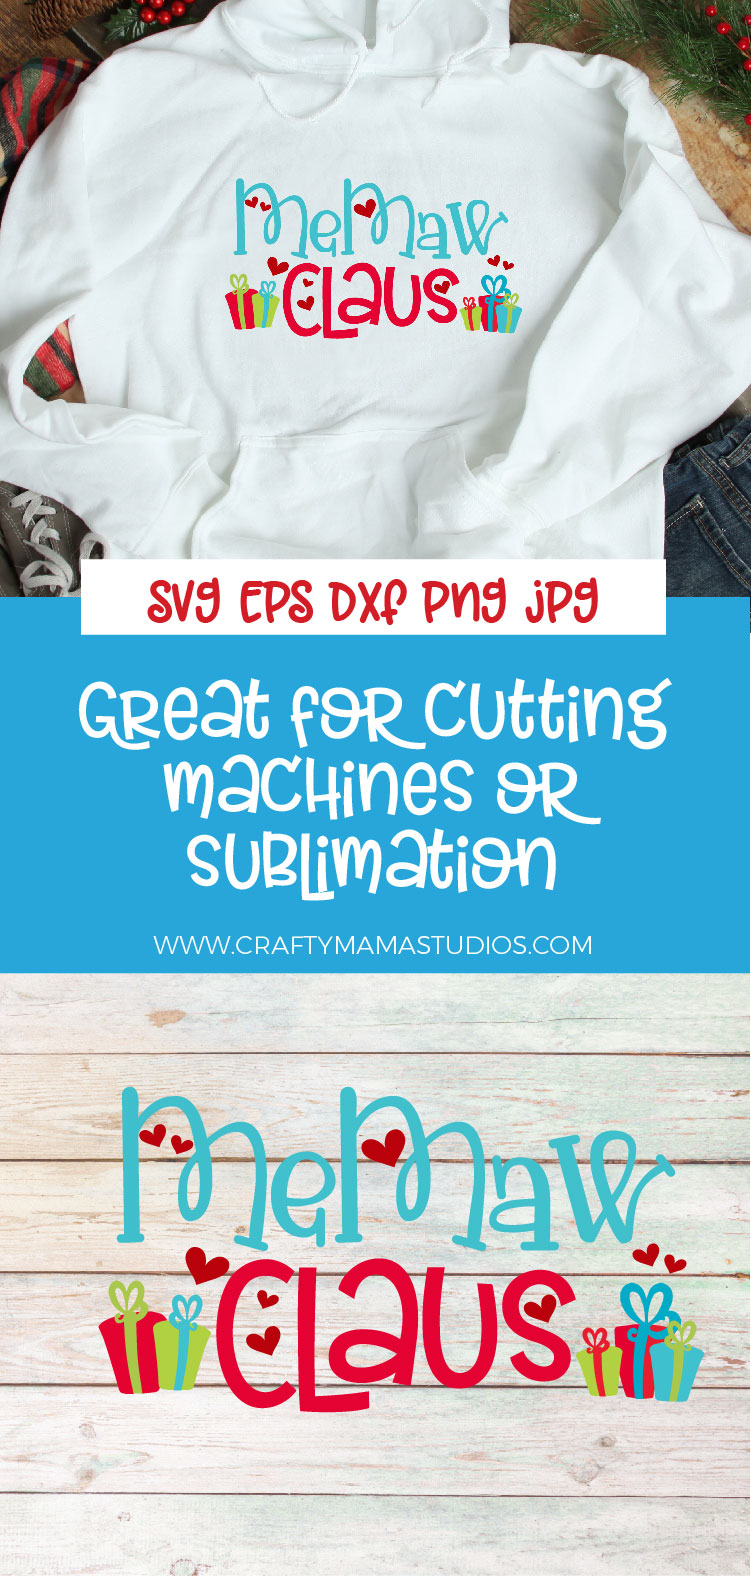 Christmas SVG, MeMaw Claus, Santa Claus Sublimation example image 3